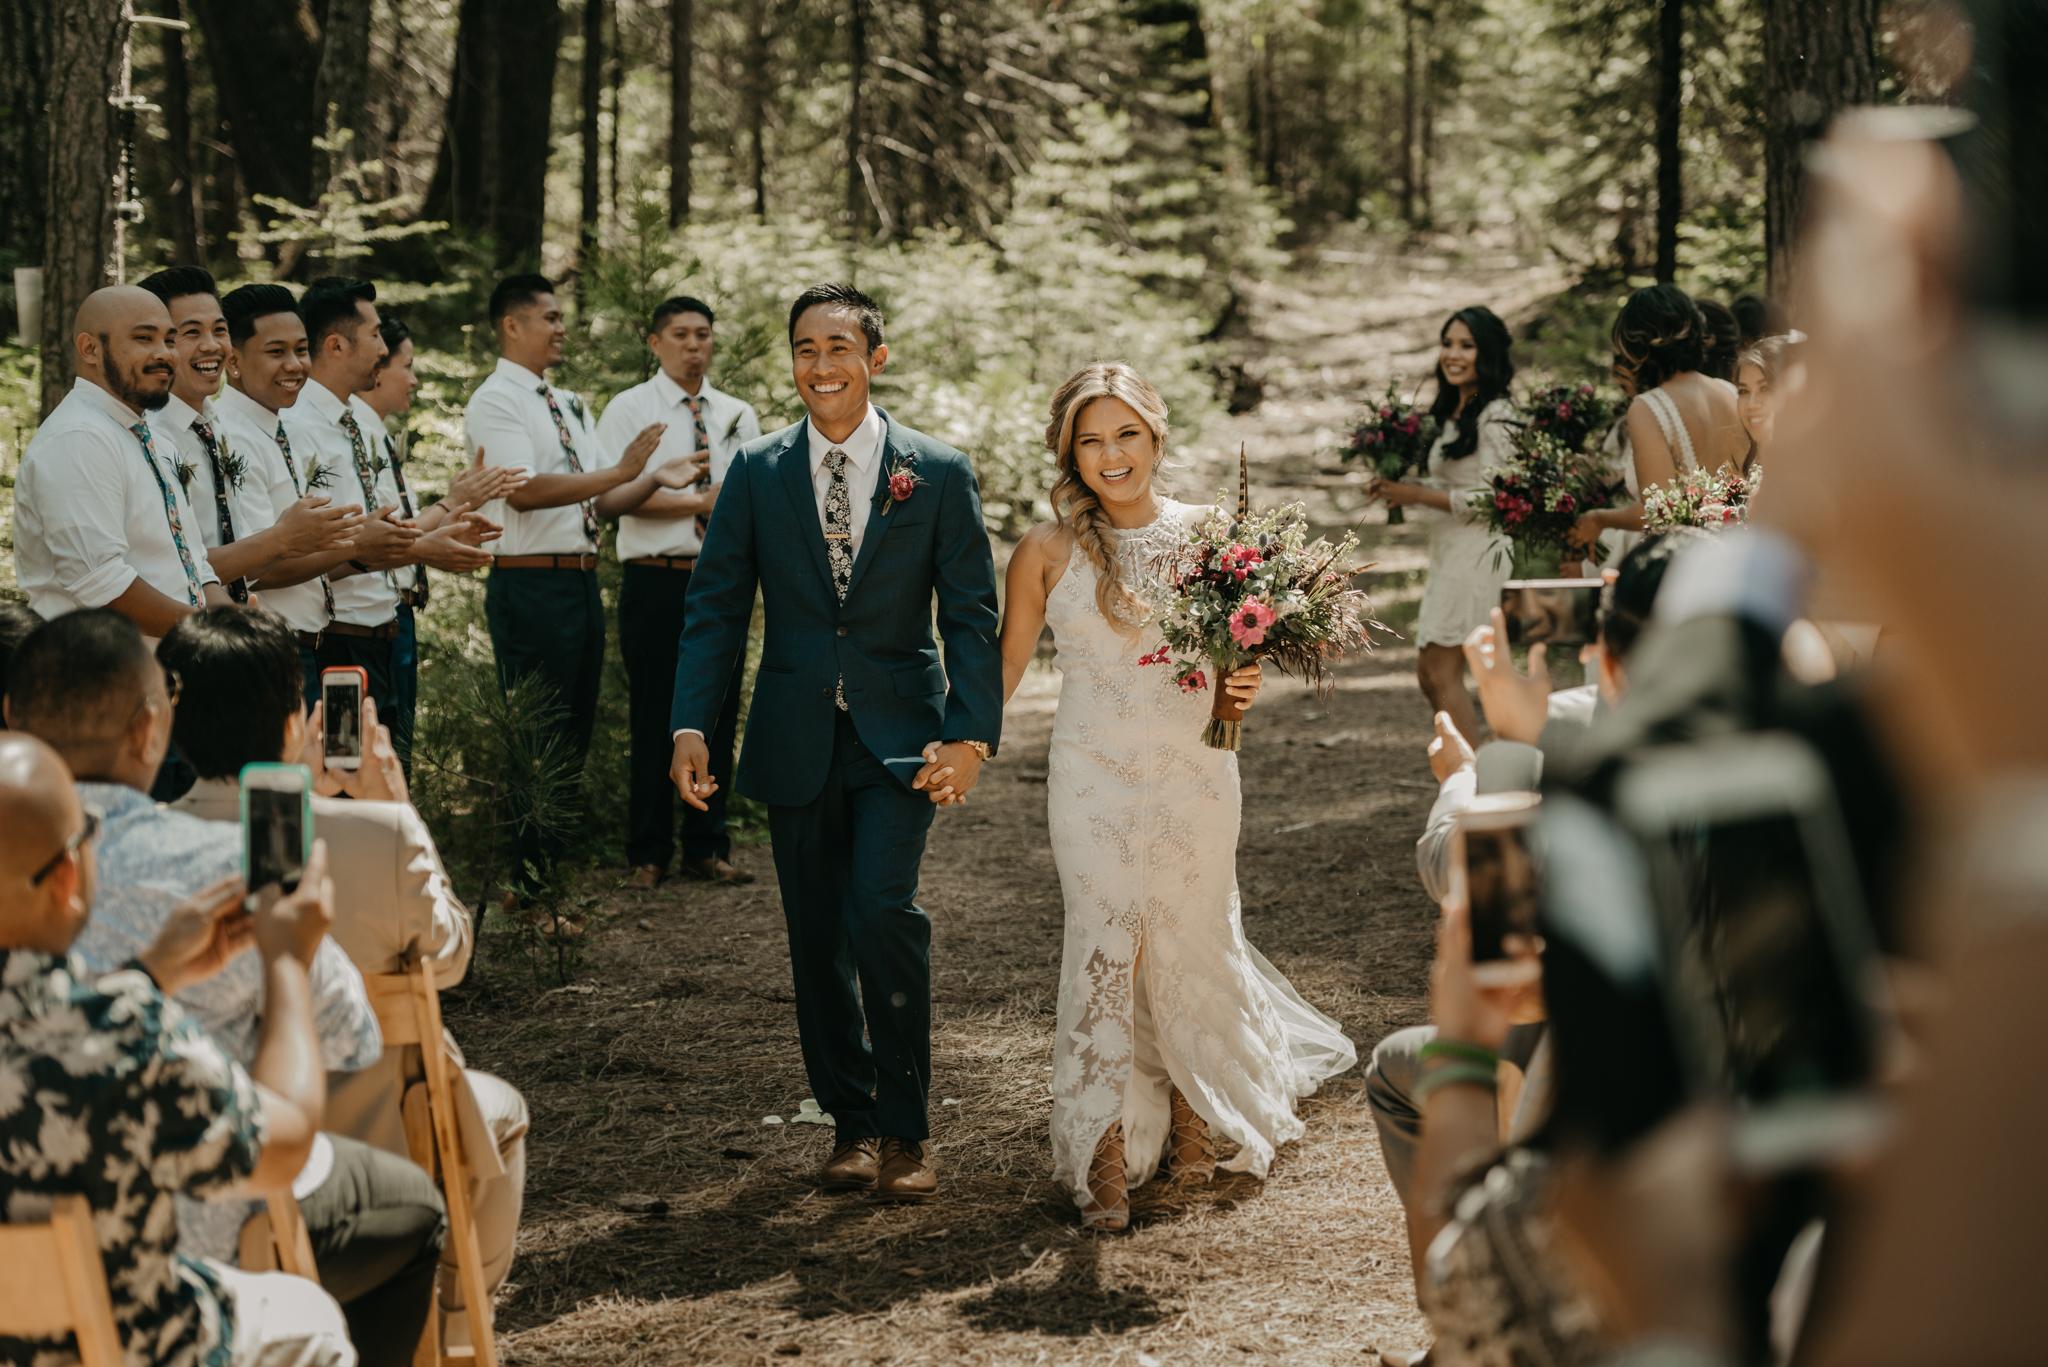 © Isaiah + Taylor Photography - Evergreen Lodge Destination Yoesmite Wedding - Los Angeles Wedding Photographer-121.jpg